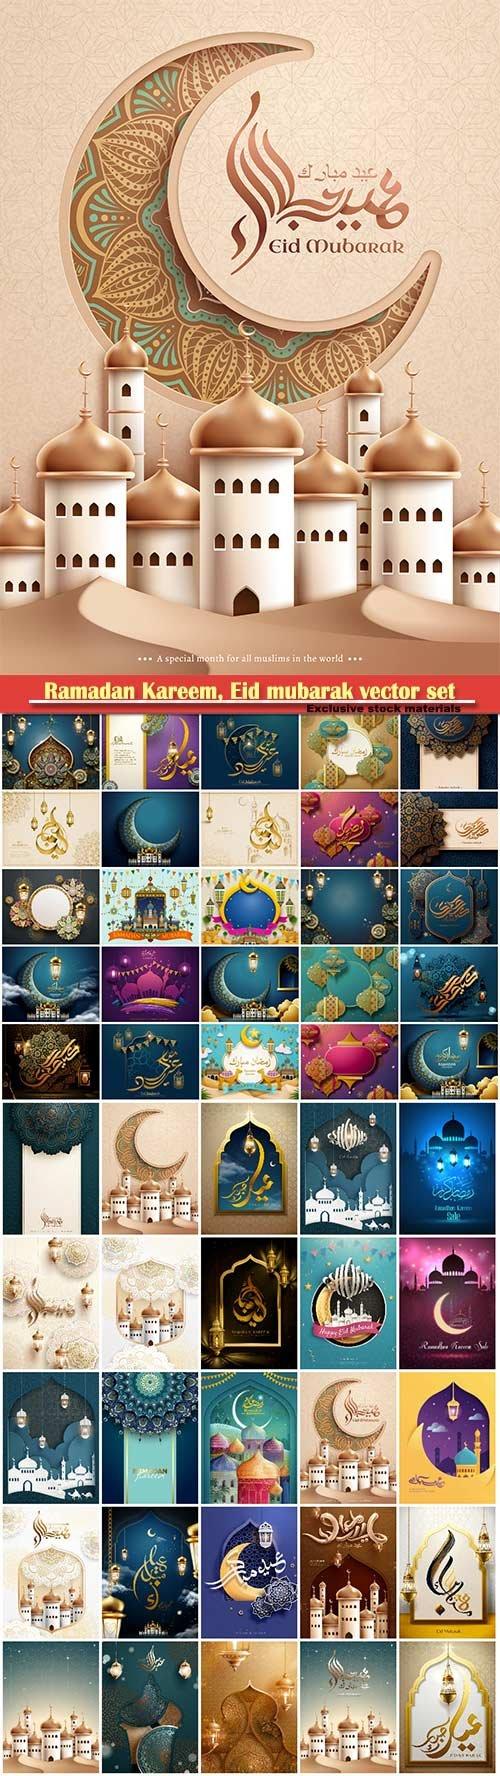 Ramadan Kareem, Eid mubarak vector set # 2